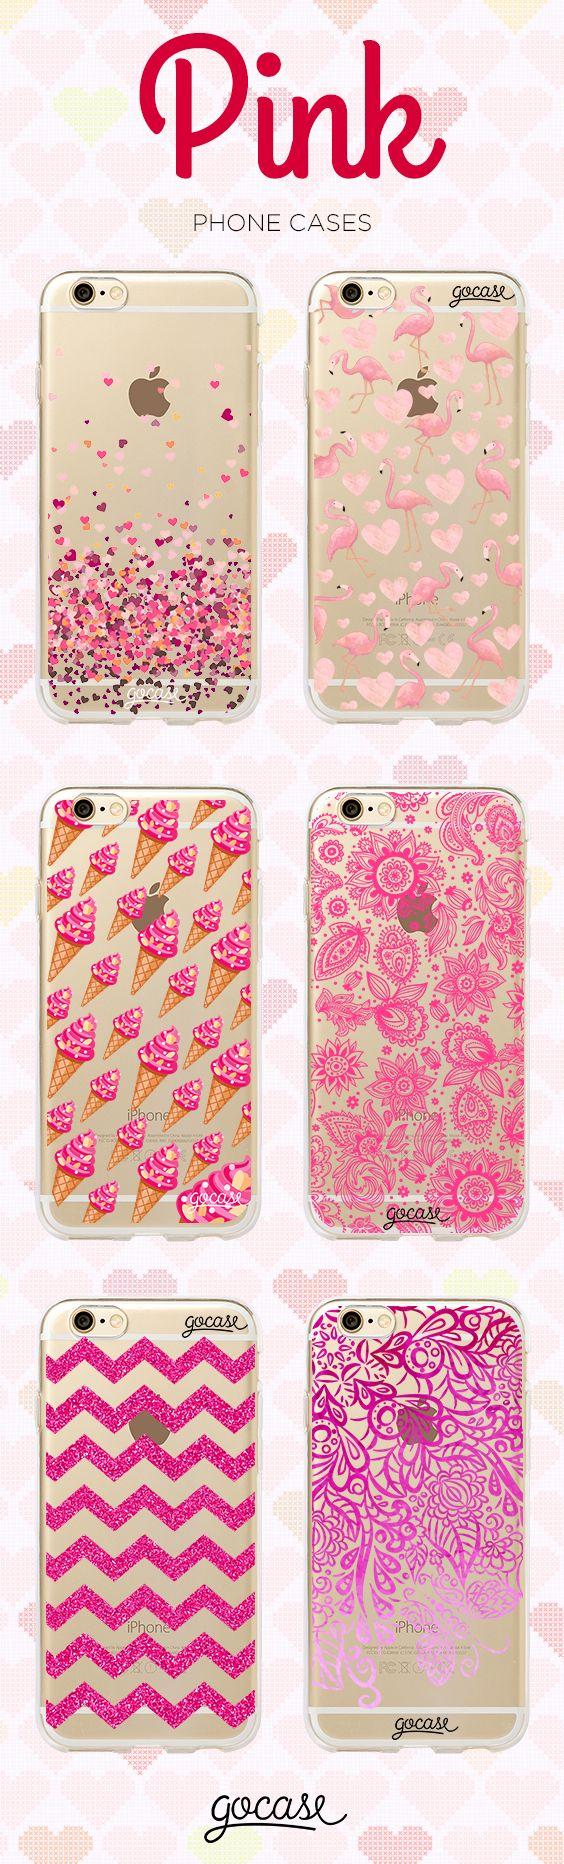 We love pink! www.shop-gocase.com